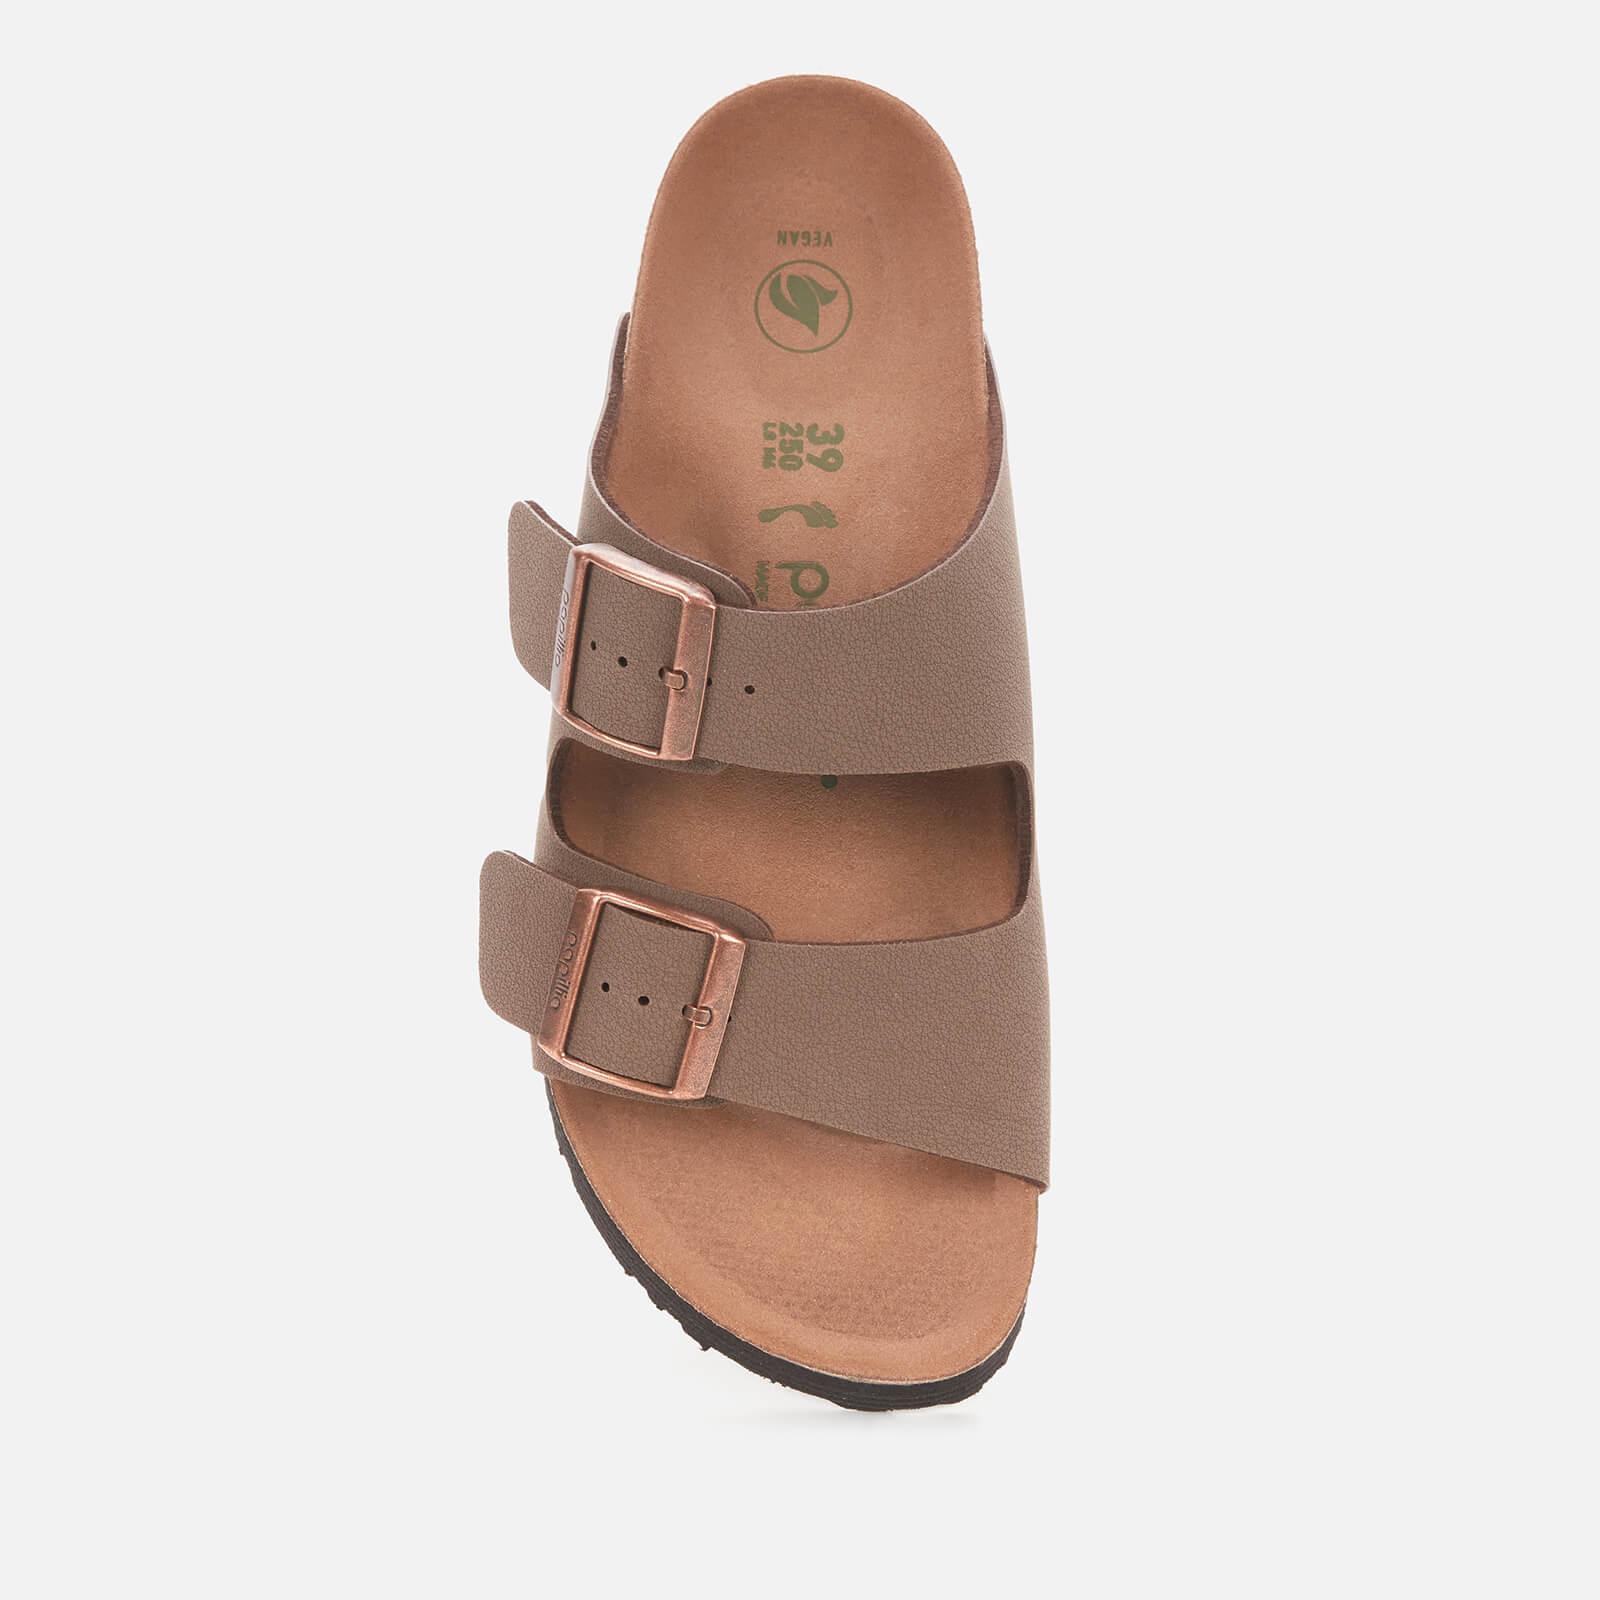 Birkenstock Women's Papillio Vegan Arizona Platform Double Strap Sandals - Mocca - Eu 41/Uk 7.5